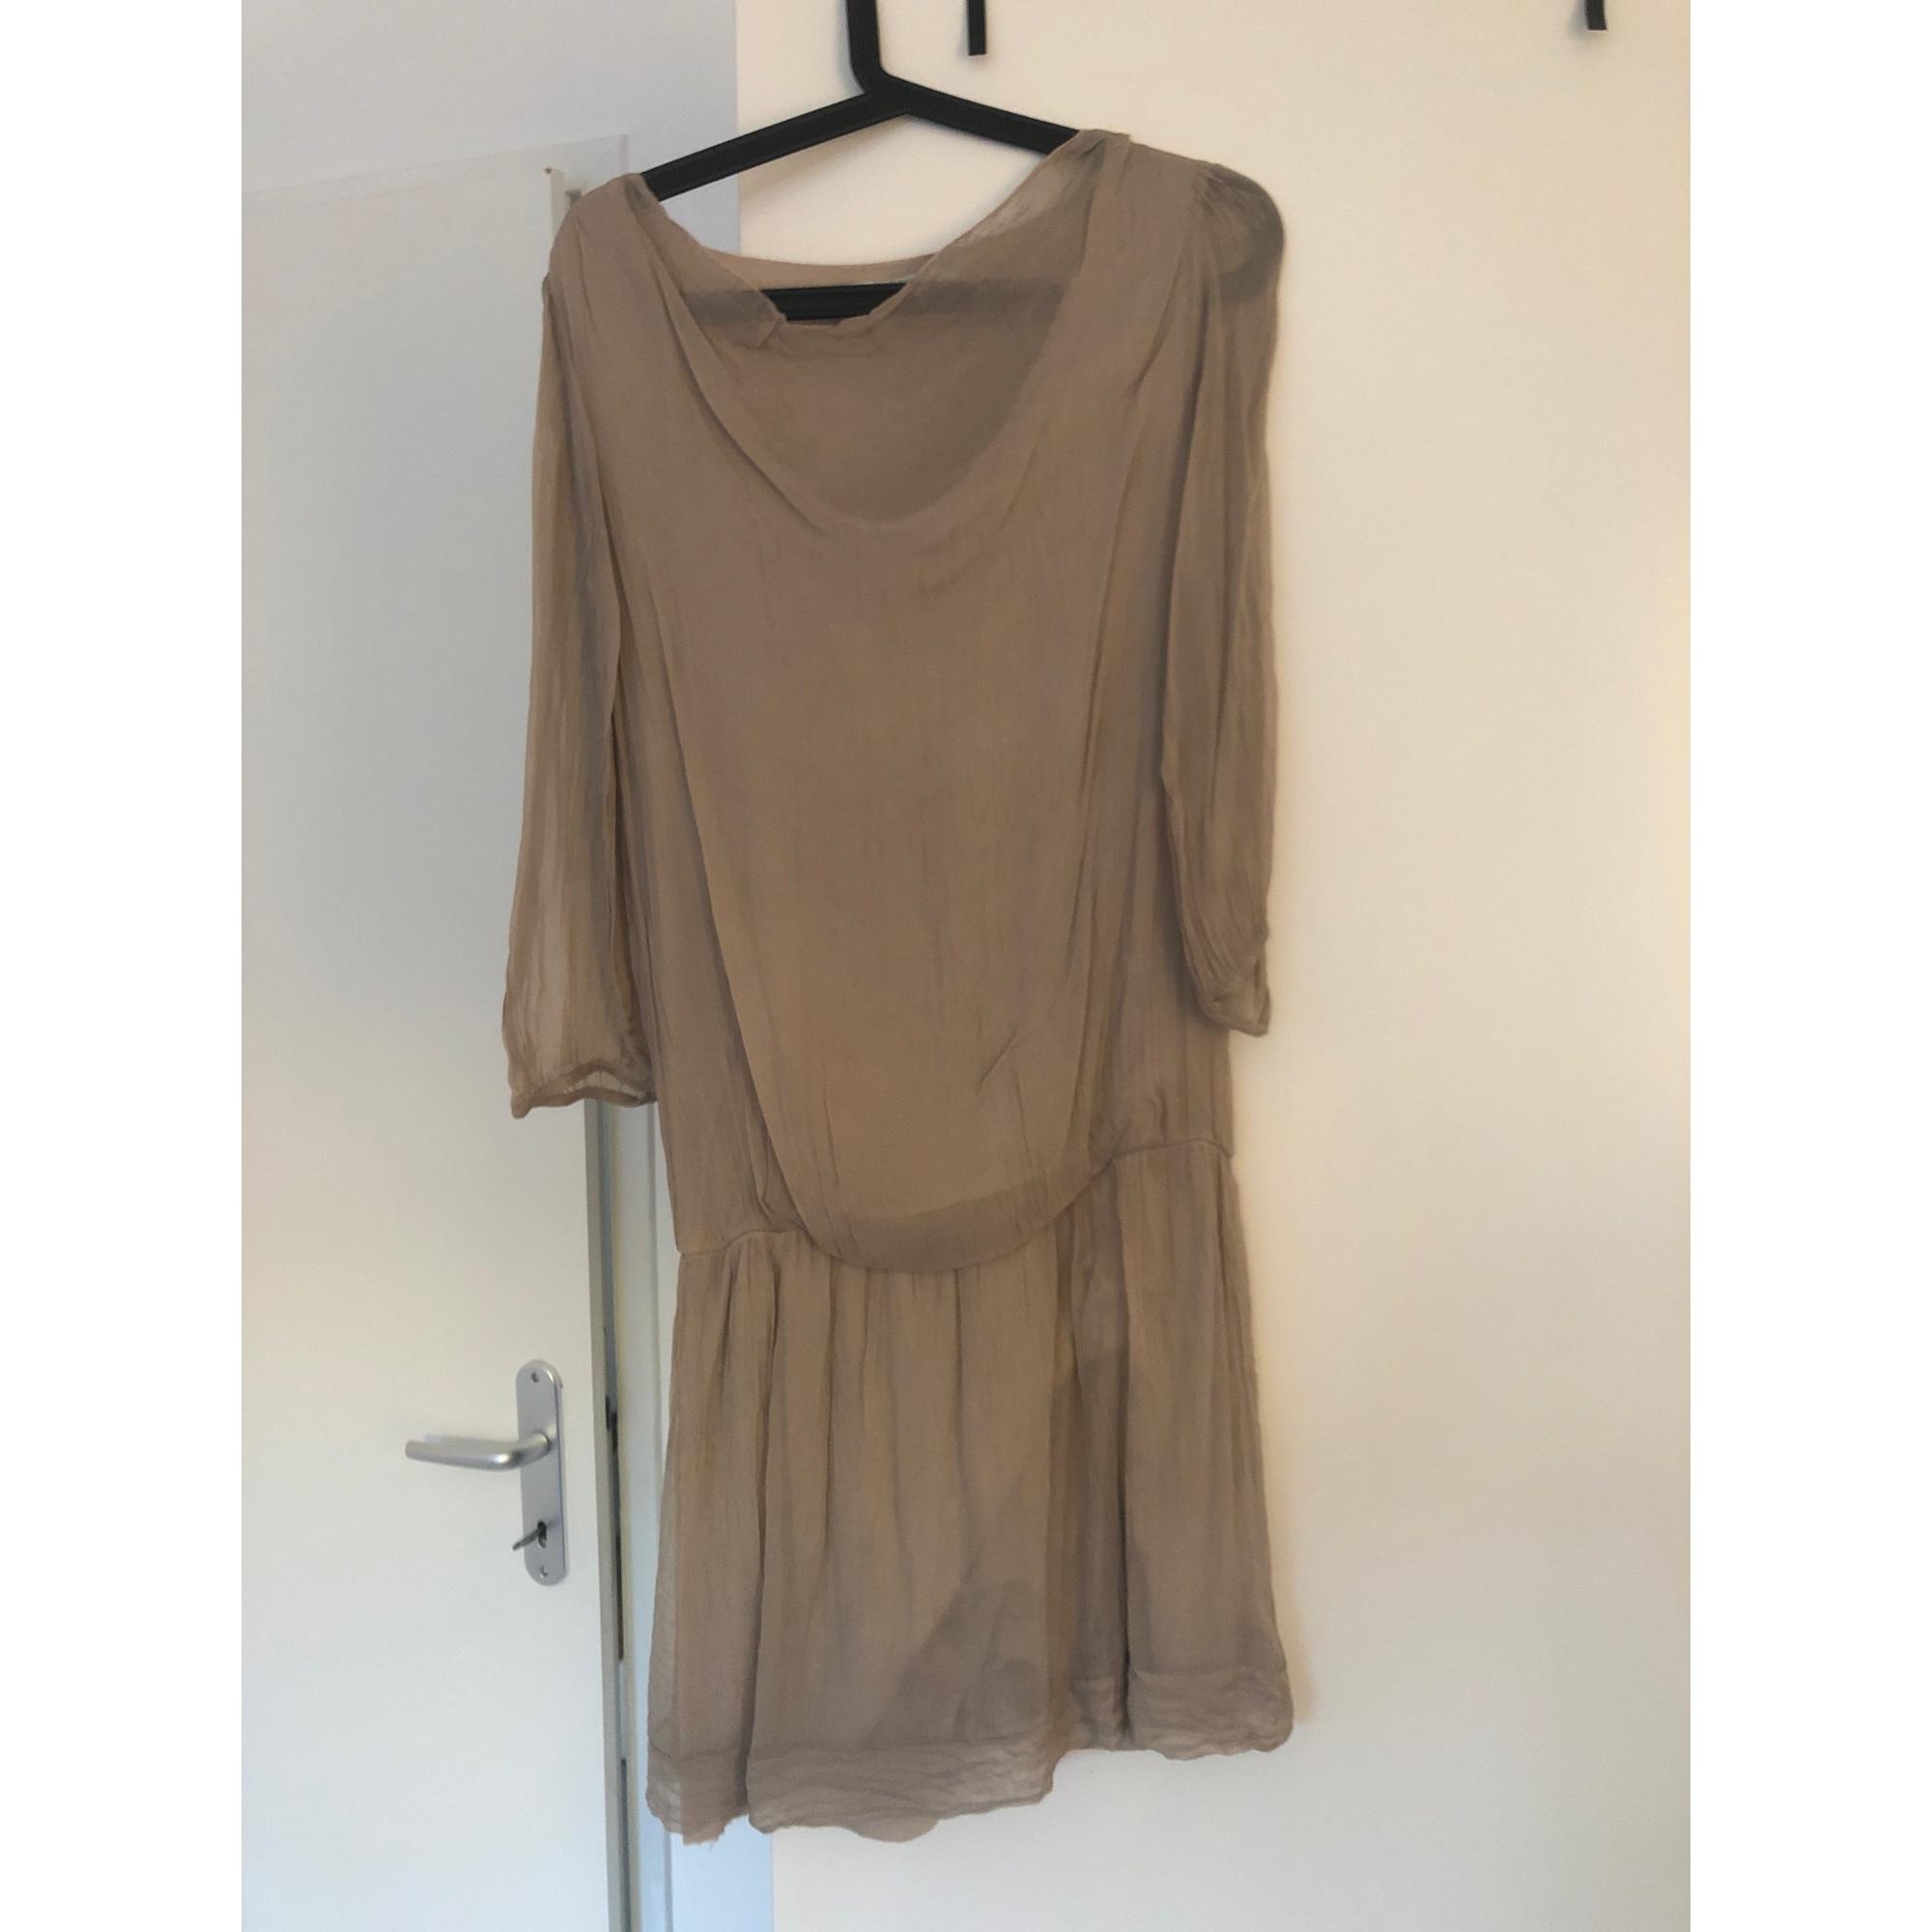 Robe courte LA FÉE MARABOUTÉE Beige, camel